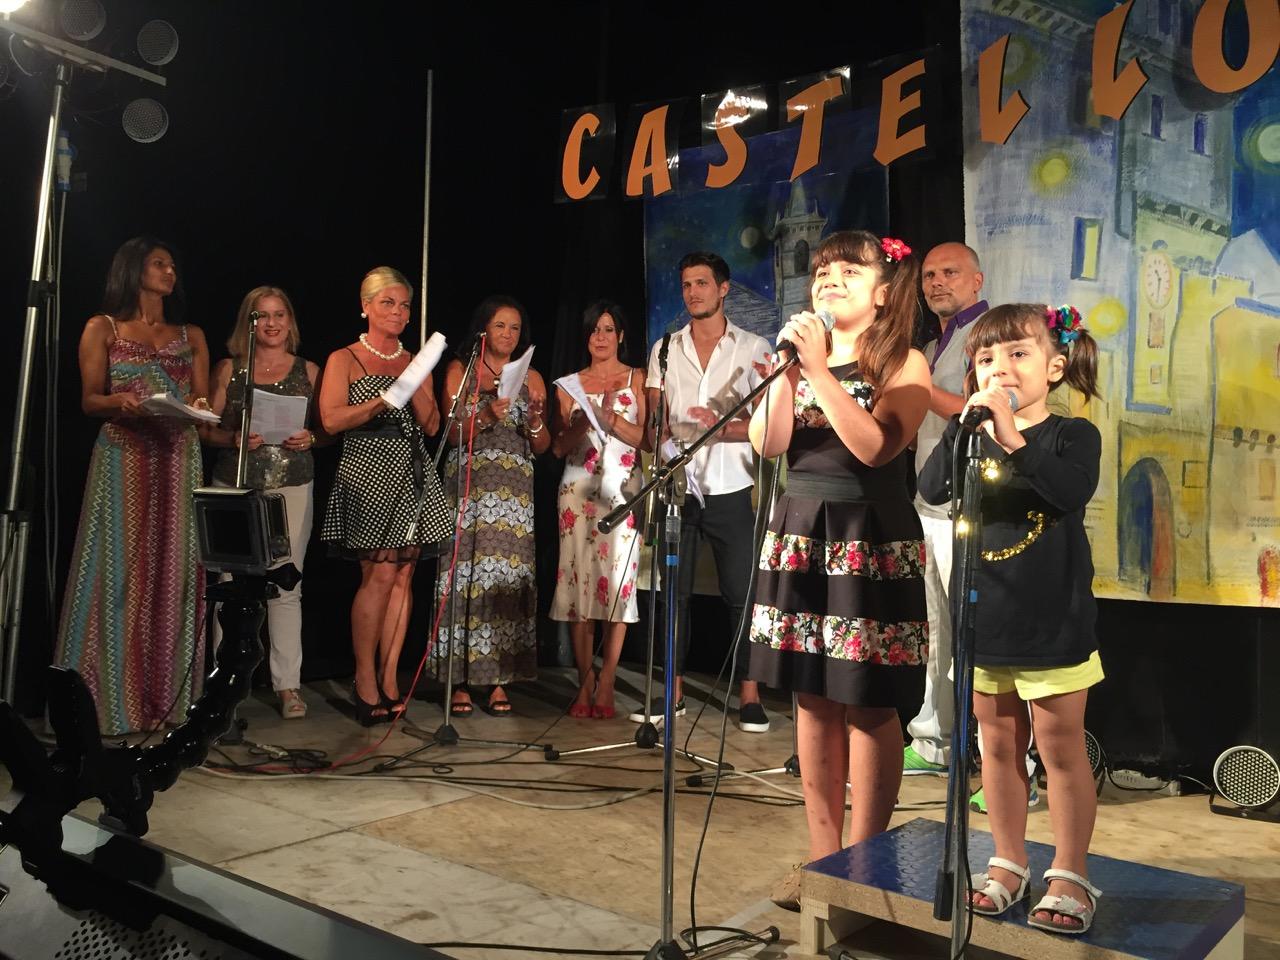 16-07-23 CASTELLO D'ORO 2016 - 3.jpg